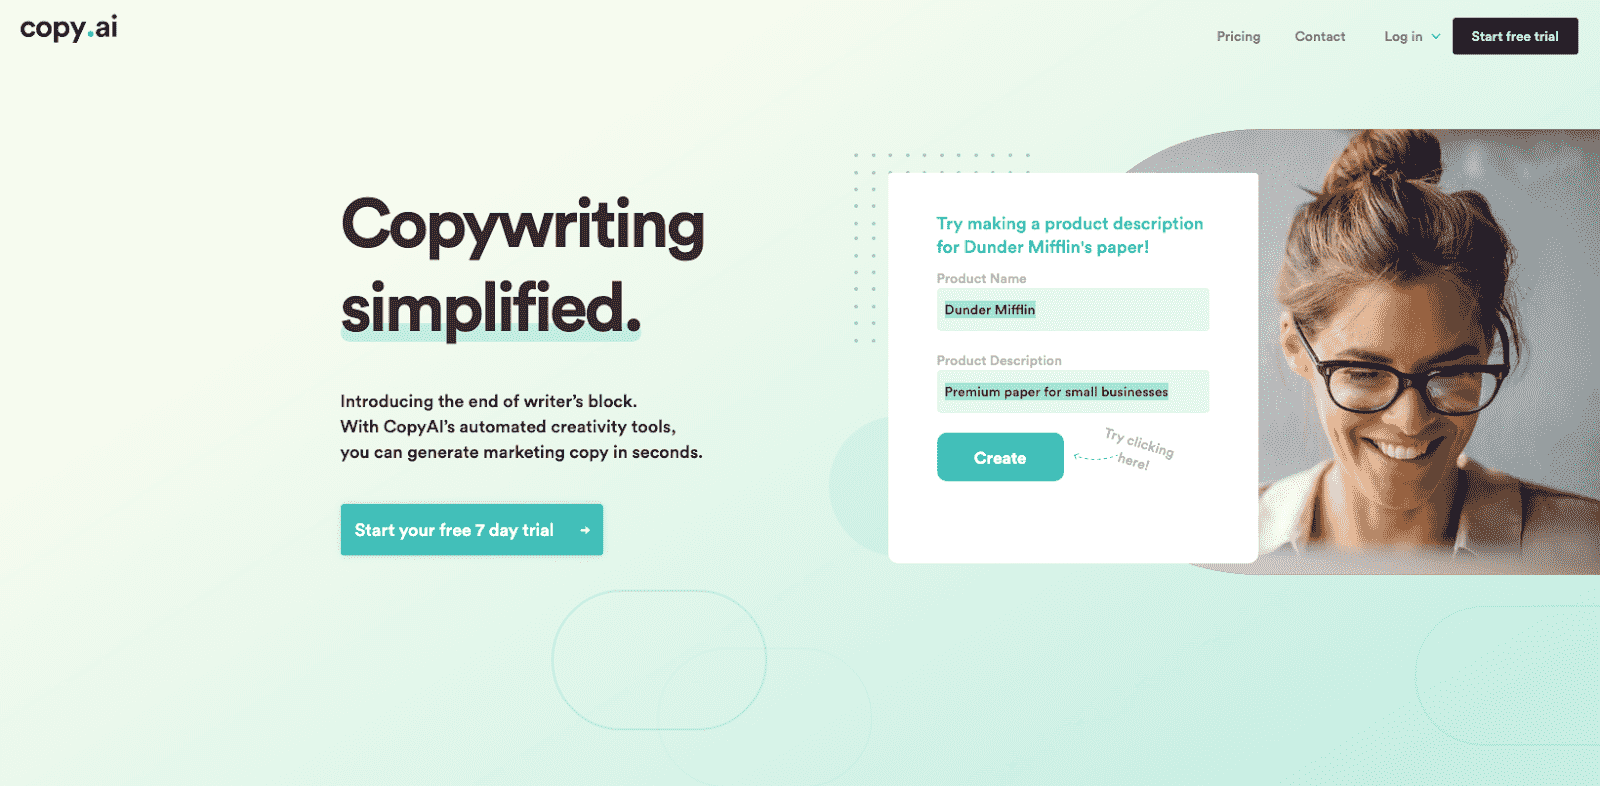 CopyAI Landing Page